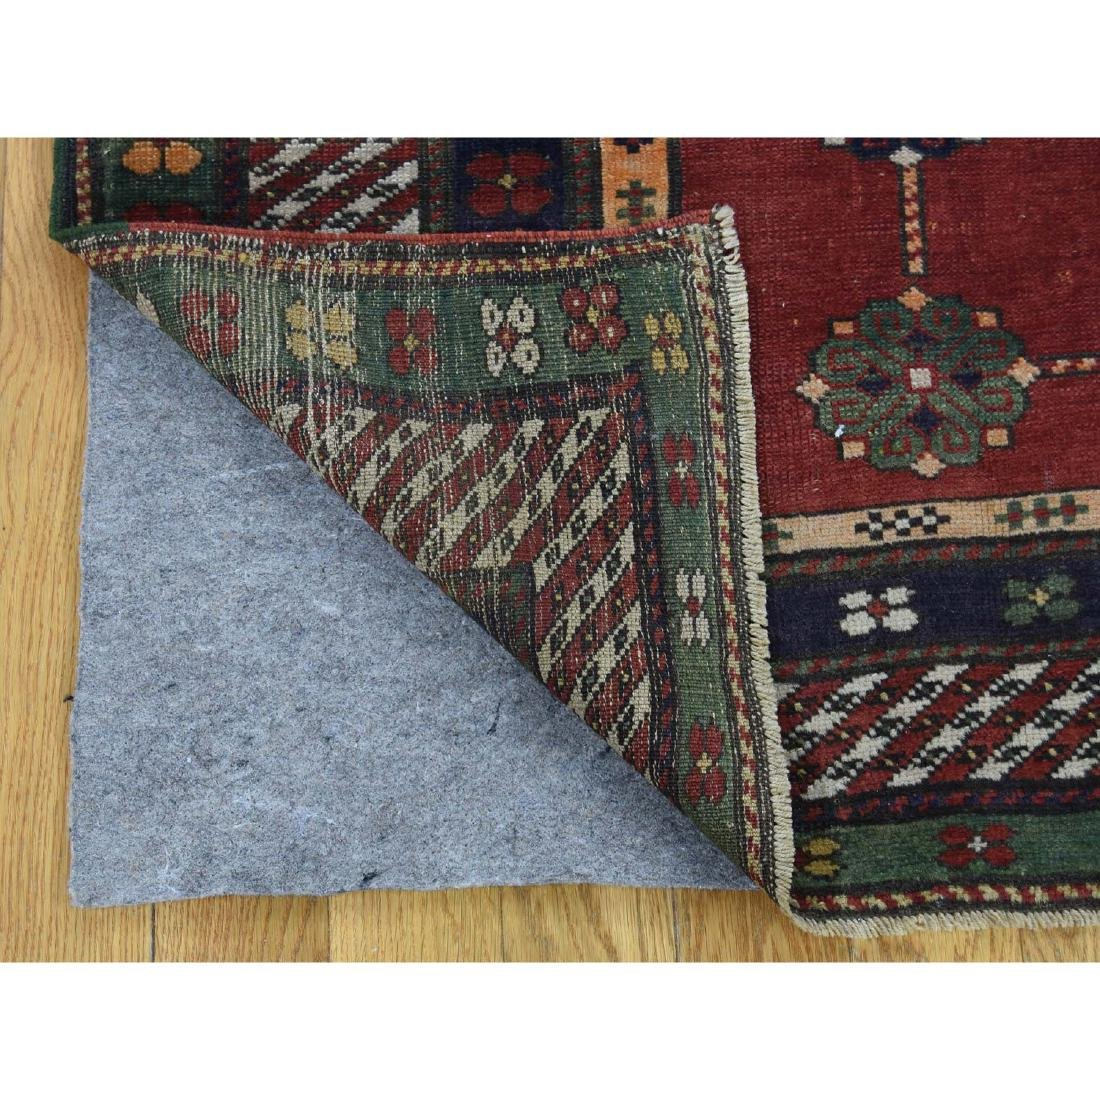 Antique Caucasian Kazak Good Condition Hand Knotted Rug - 5